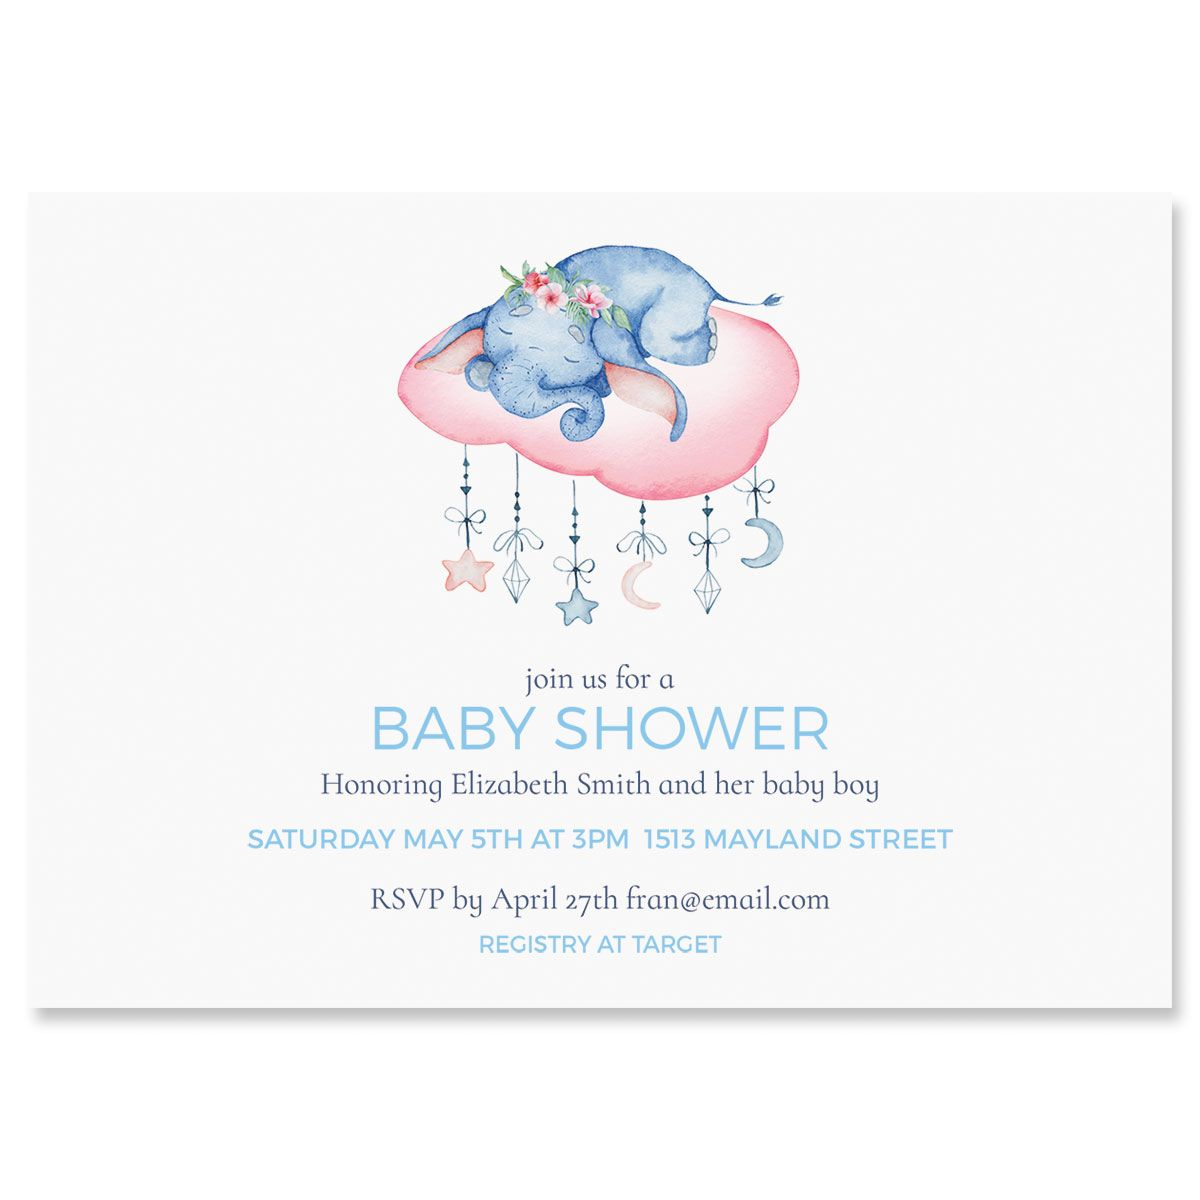 Personalized Sleepy Elephant Shower Invitations